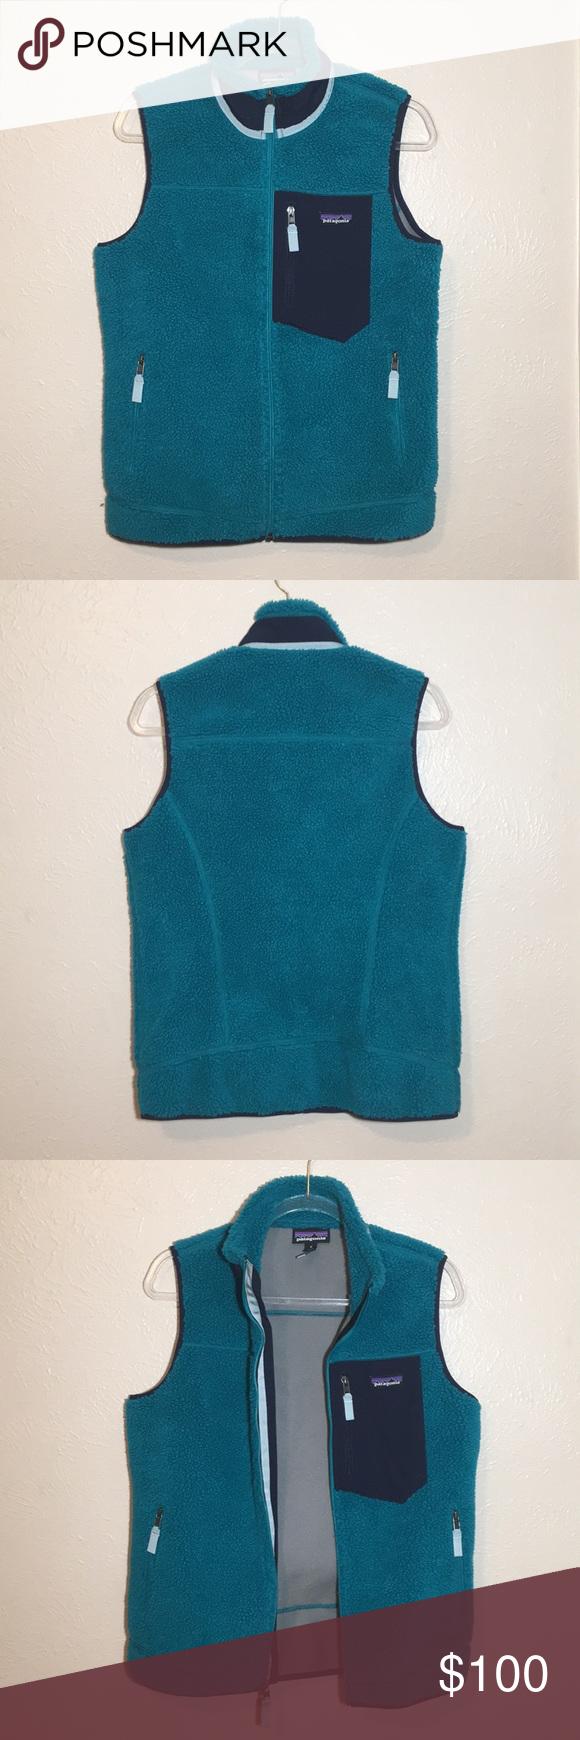 Patagonia Retro X Vest Almost New Condition This Vest Has